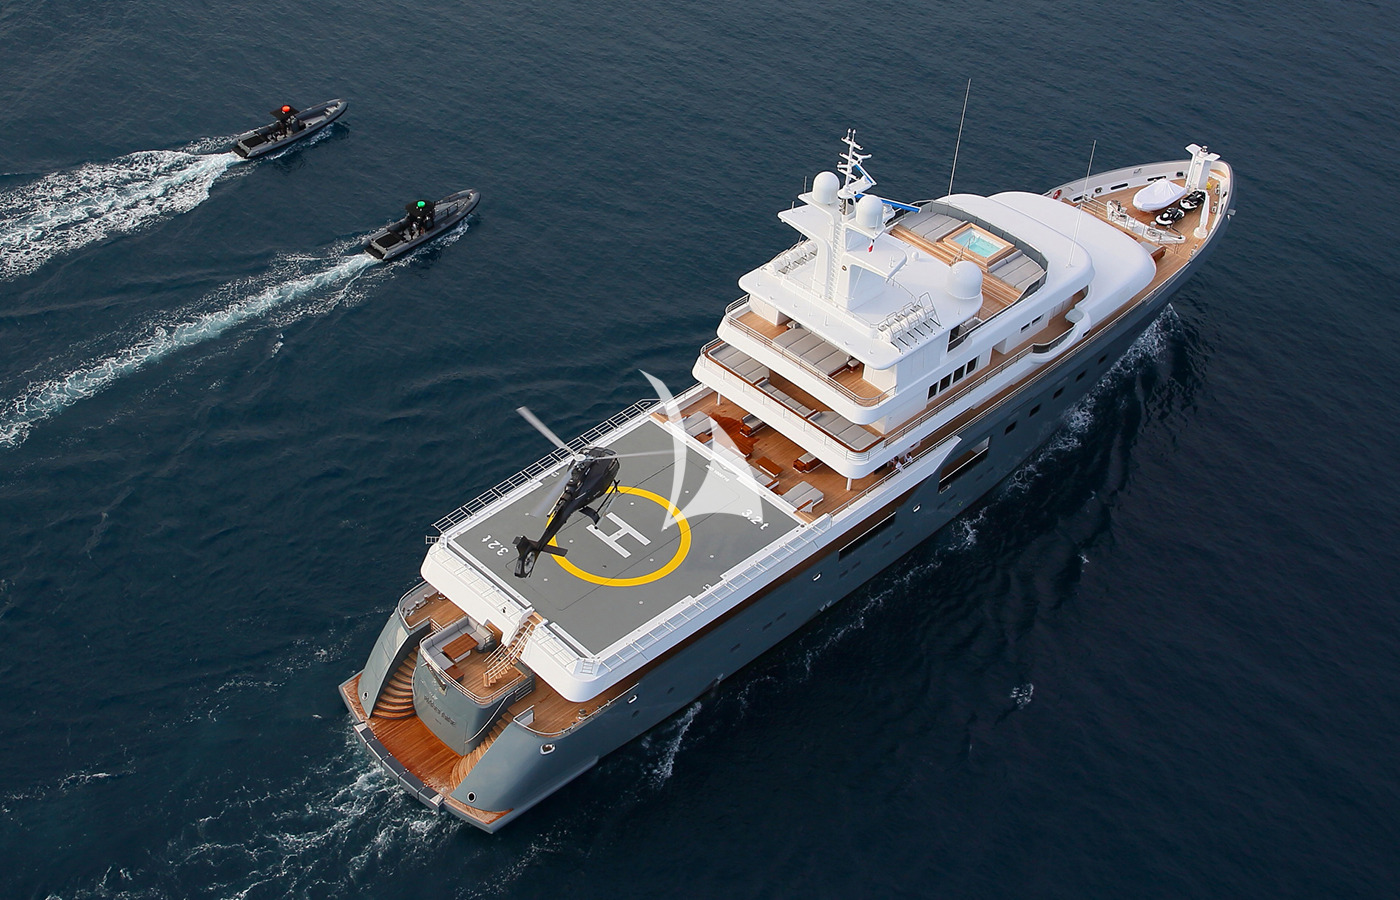 motor yacht, superyacht, luxury yacht, crewed motor yacht, planet nine, yacht planet nine